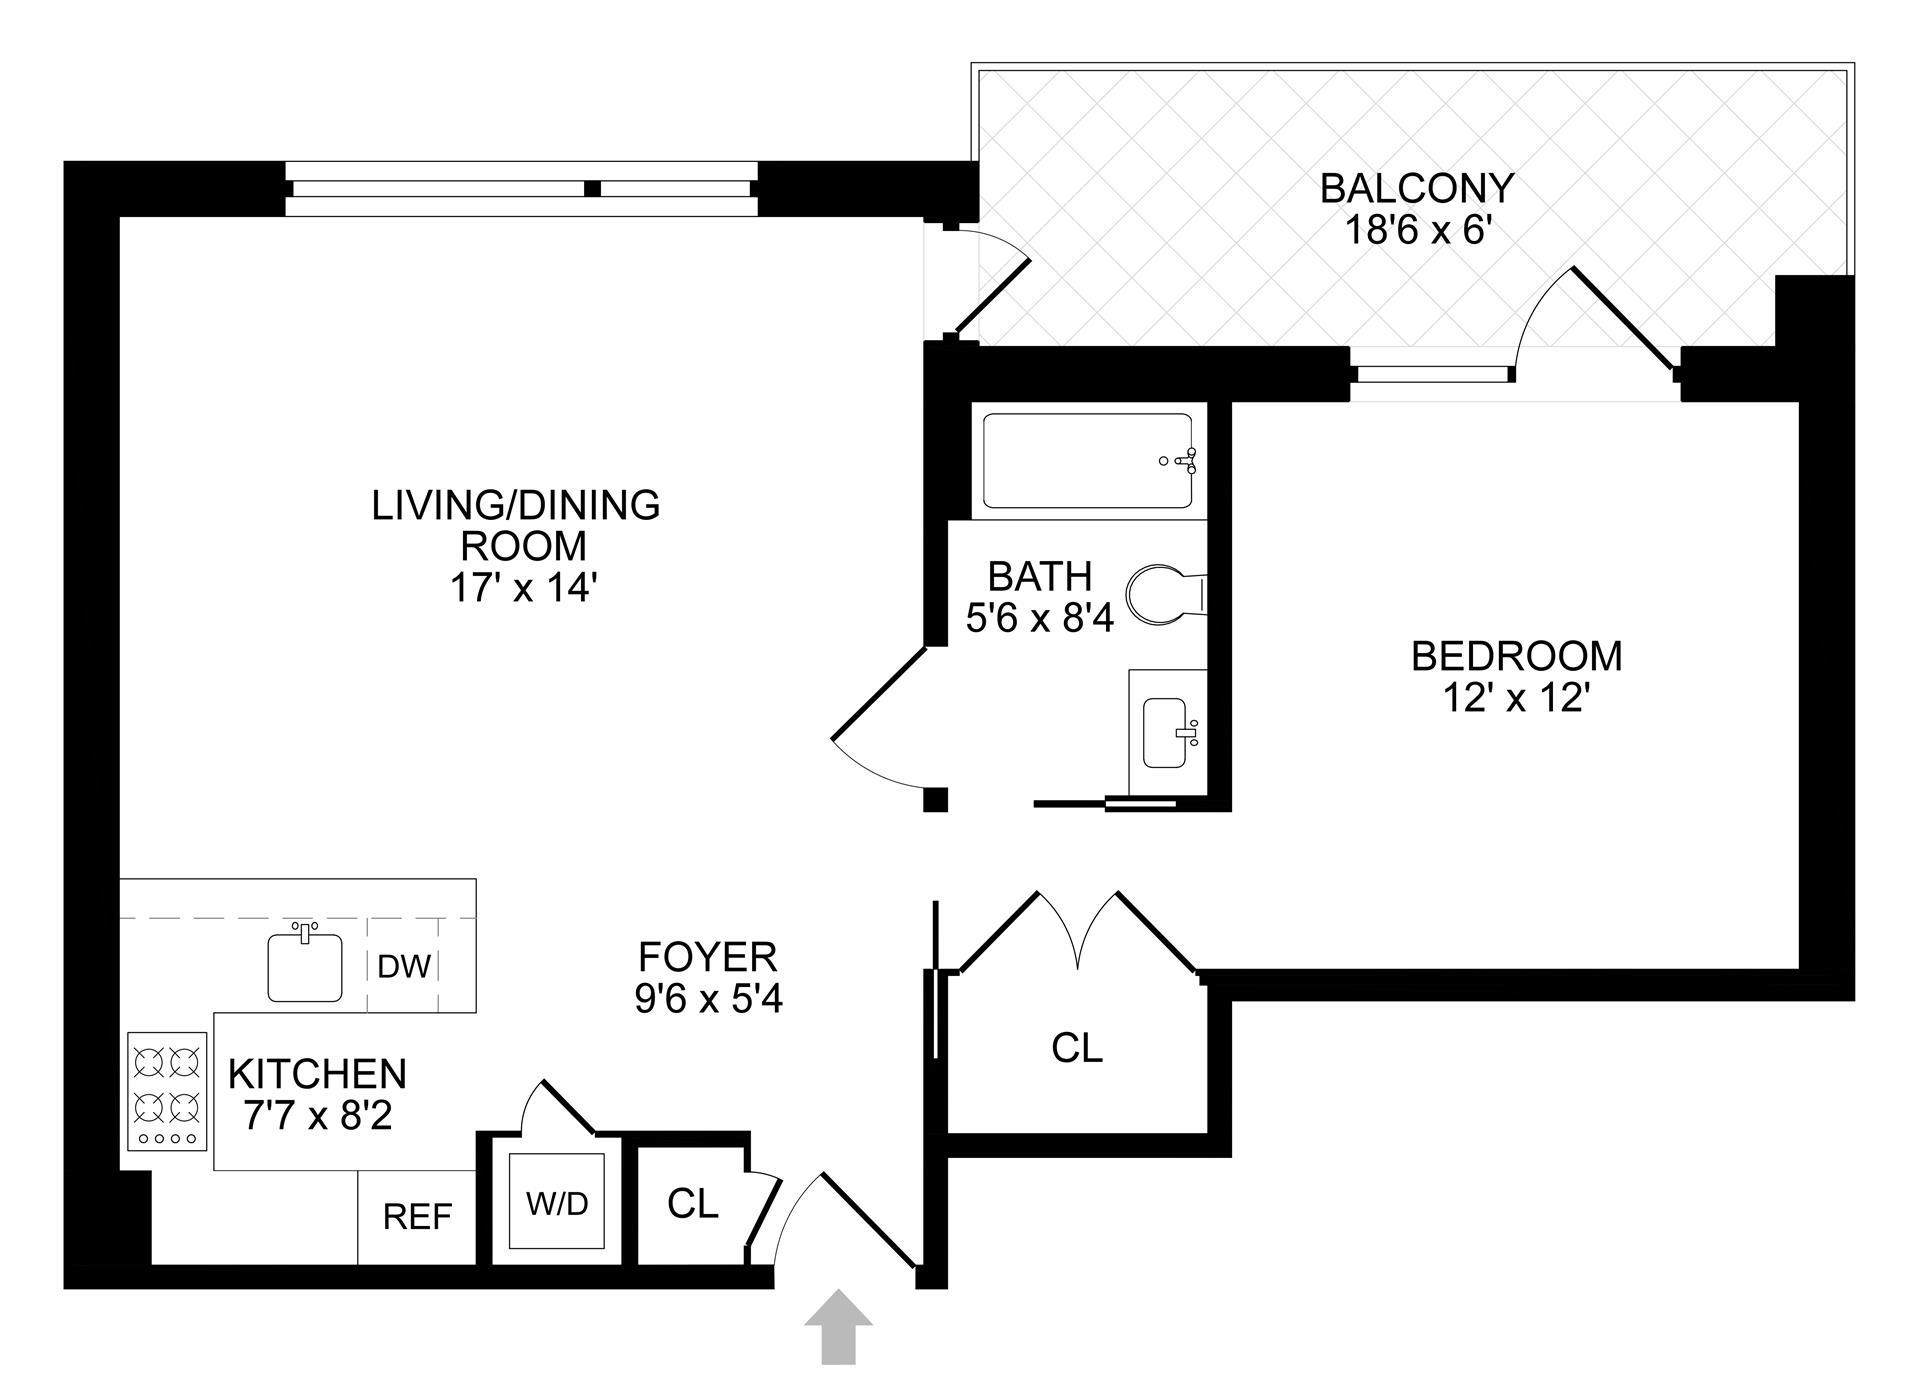 Floor plan of 299 Van Buren St, 2B - Bedford - Stuyvesant, New York